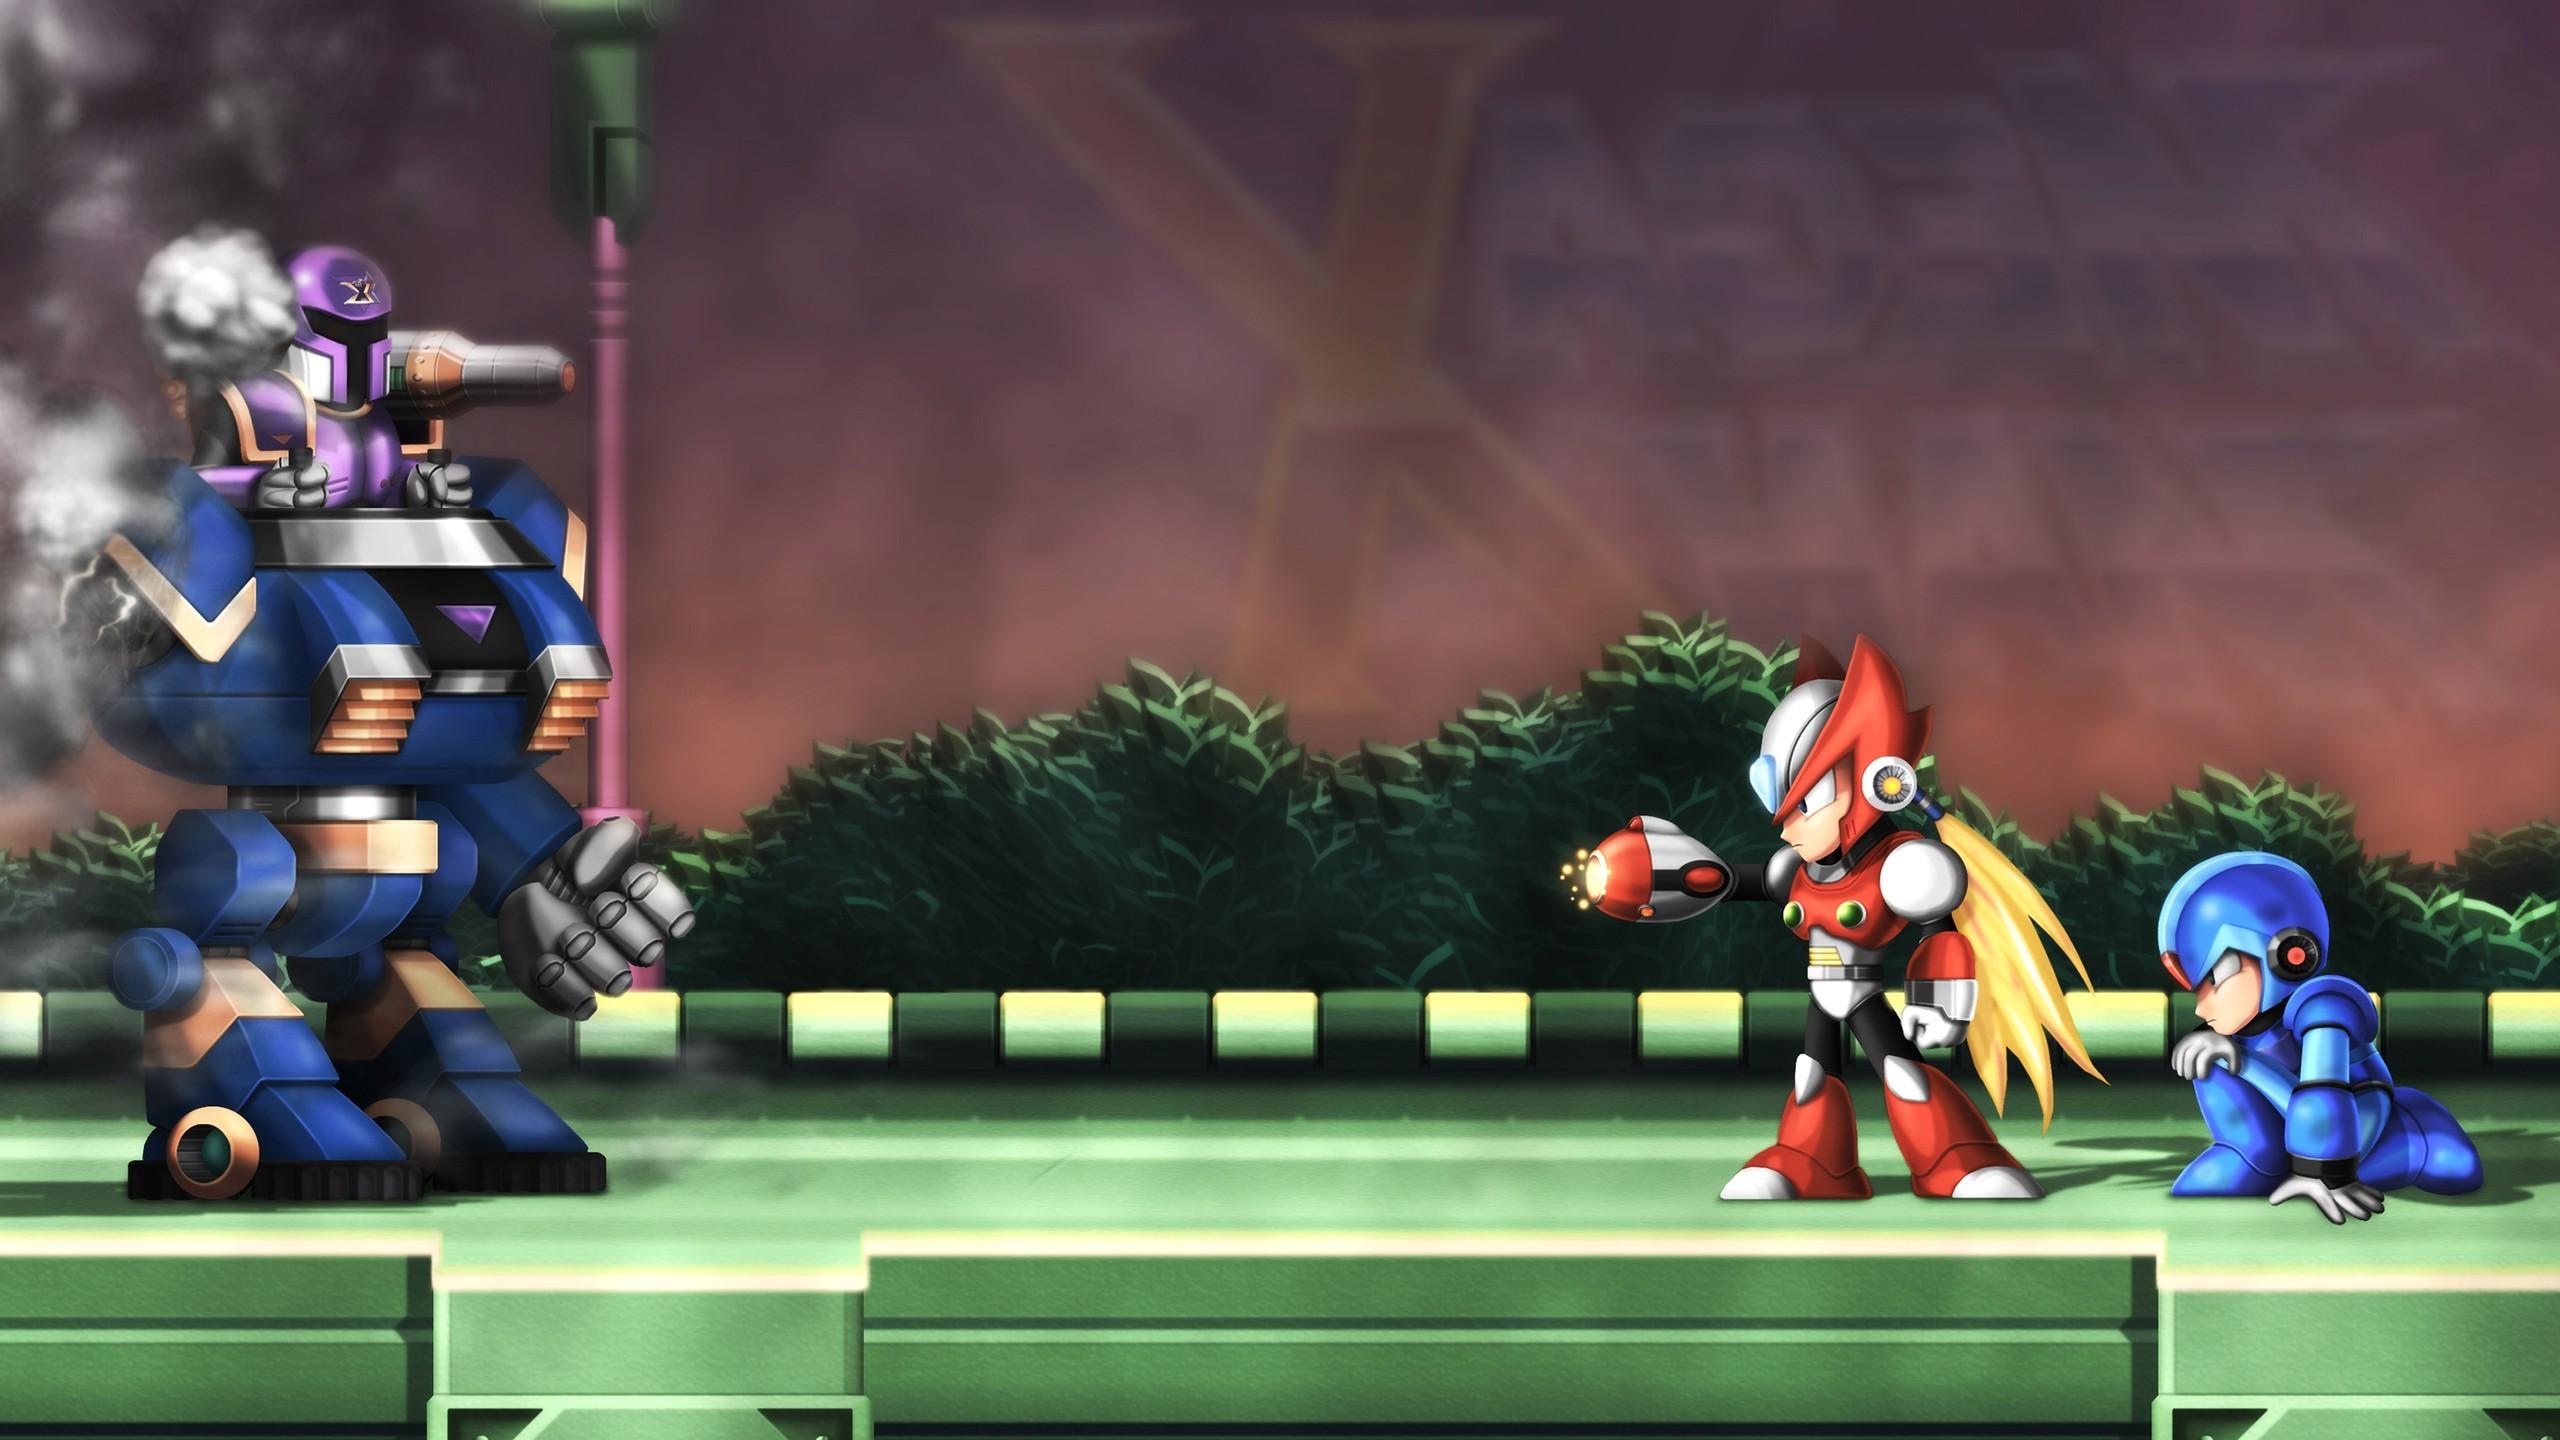 Mega Man X, Retro Games, Mega Man Wallpapers HD / Desktop and Mobile  Backgrounds